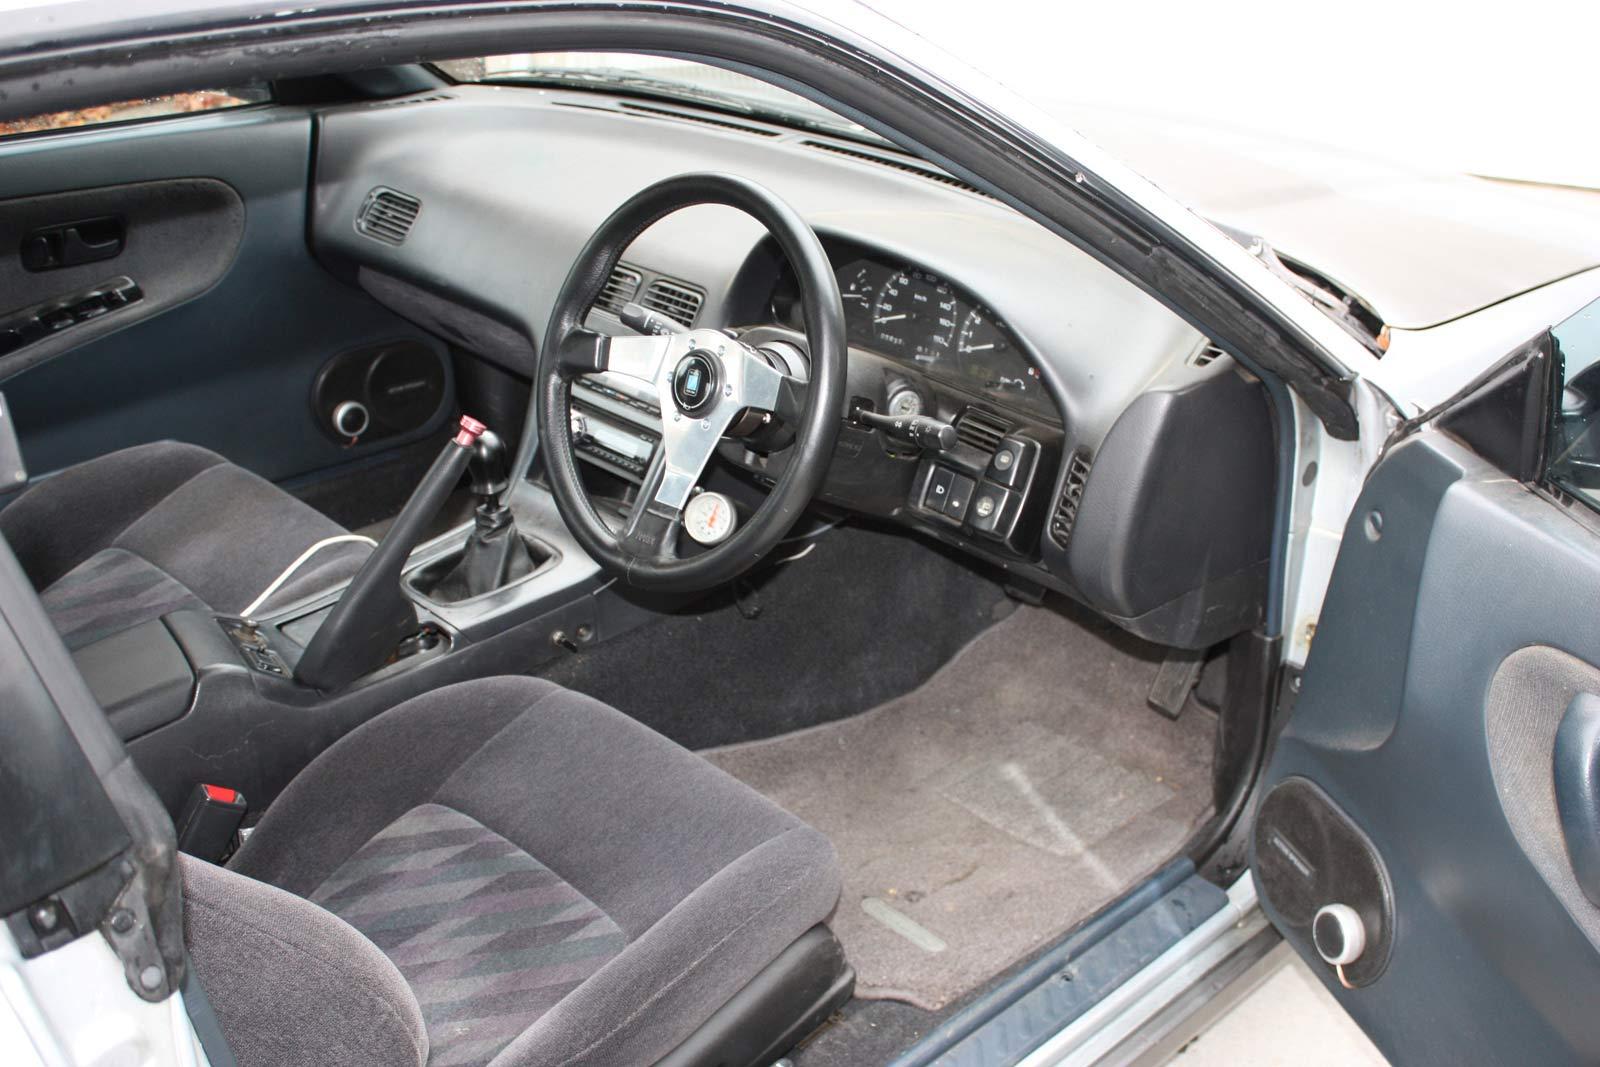 1991 nissan 240sx interior fuse diagram